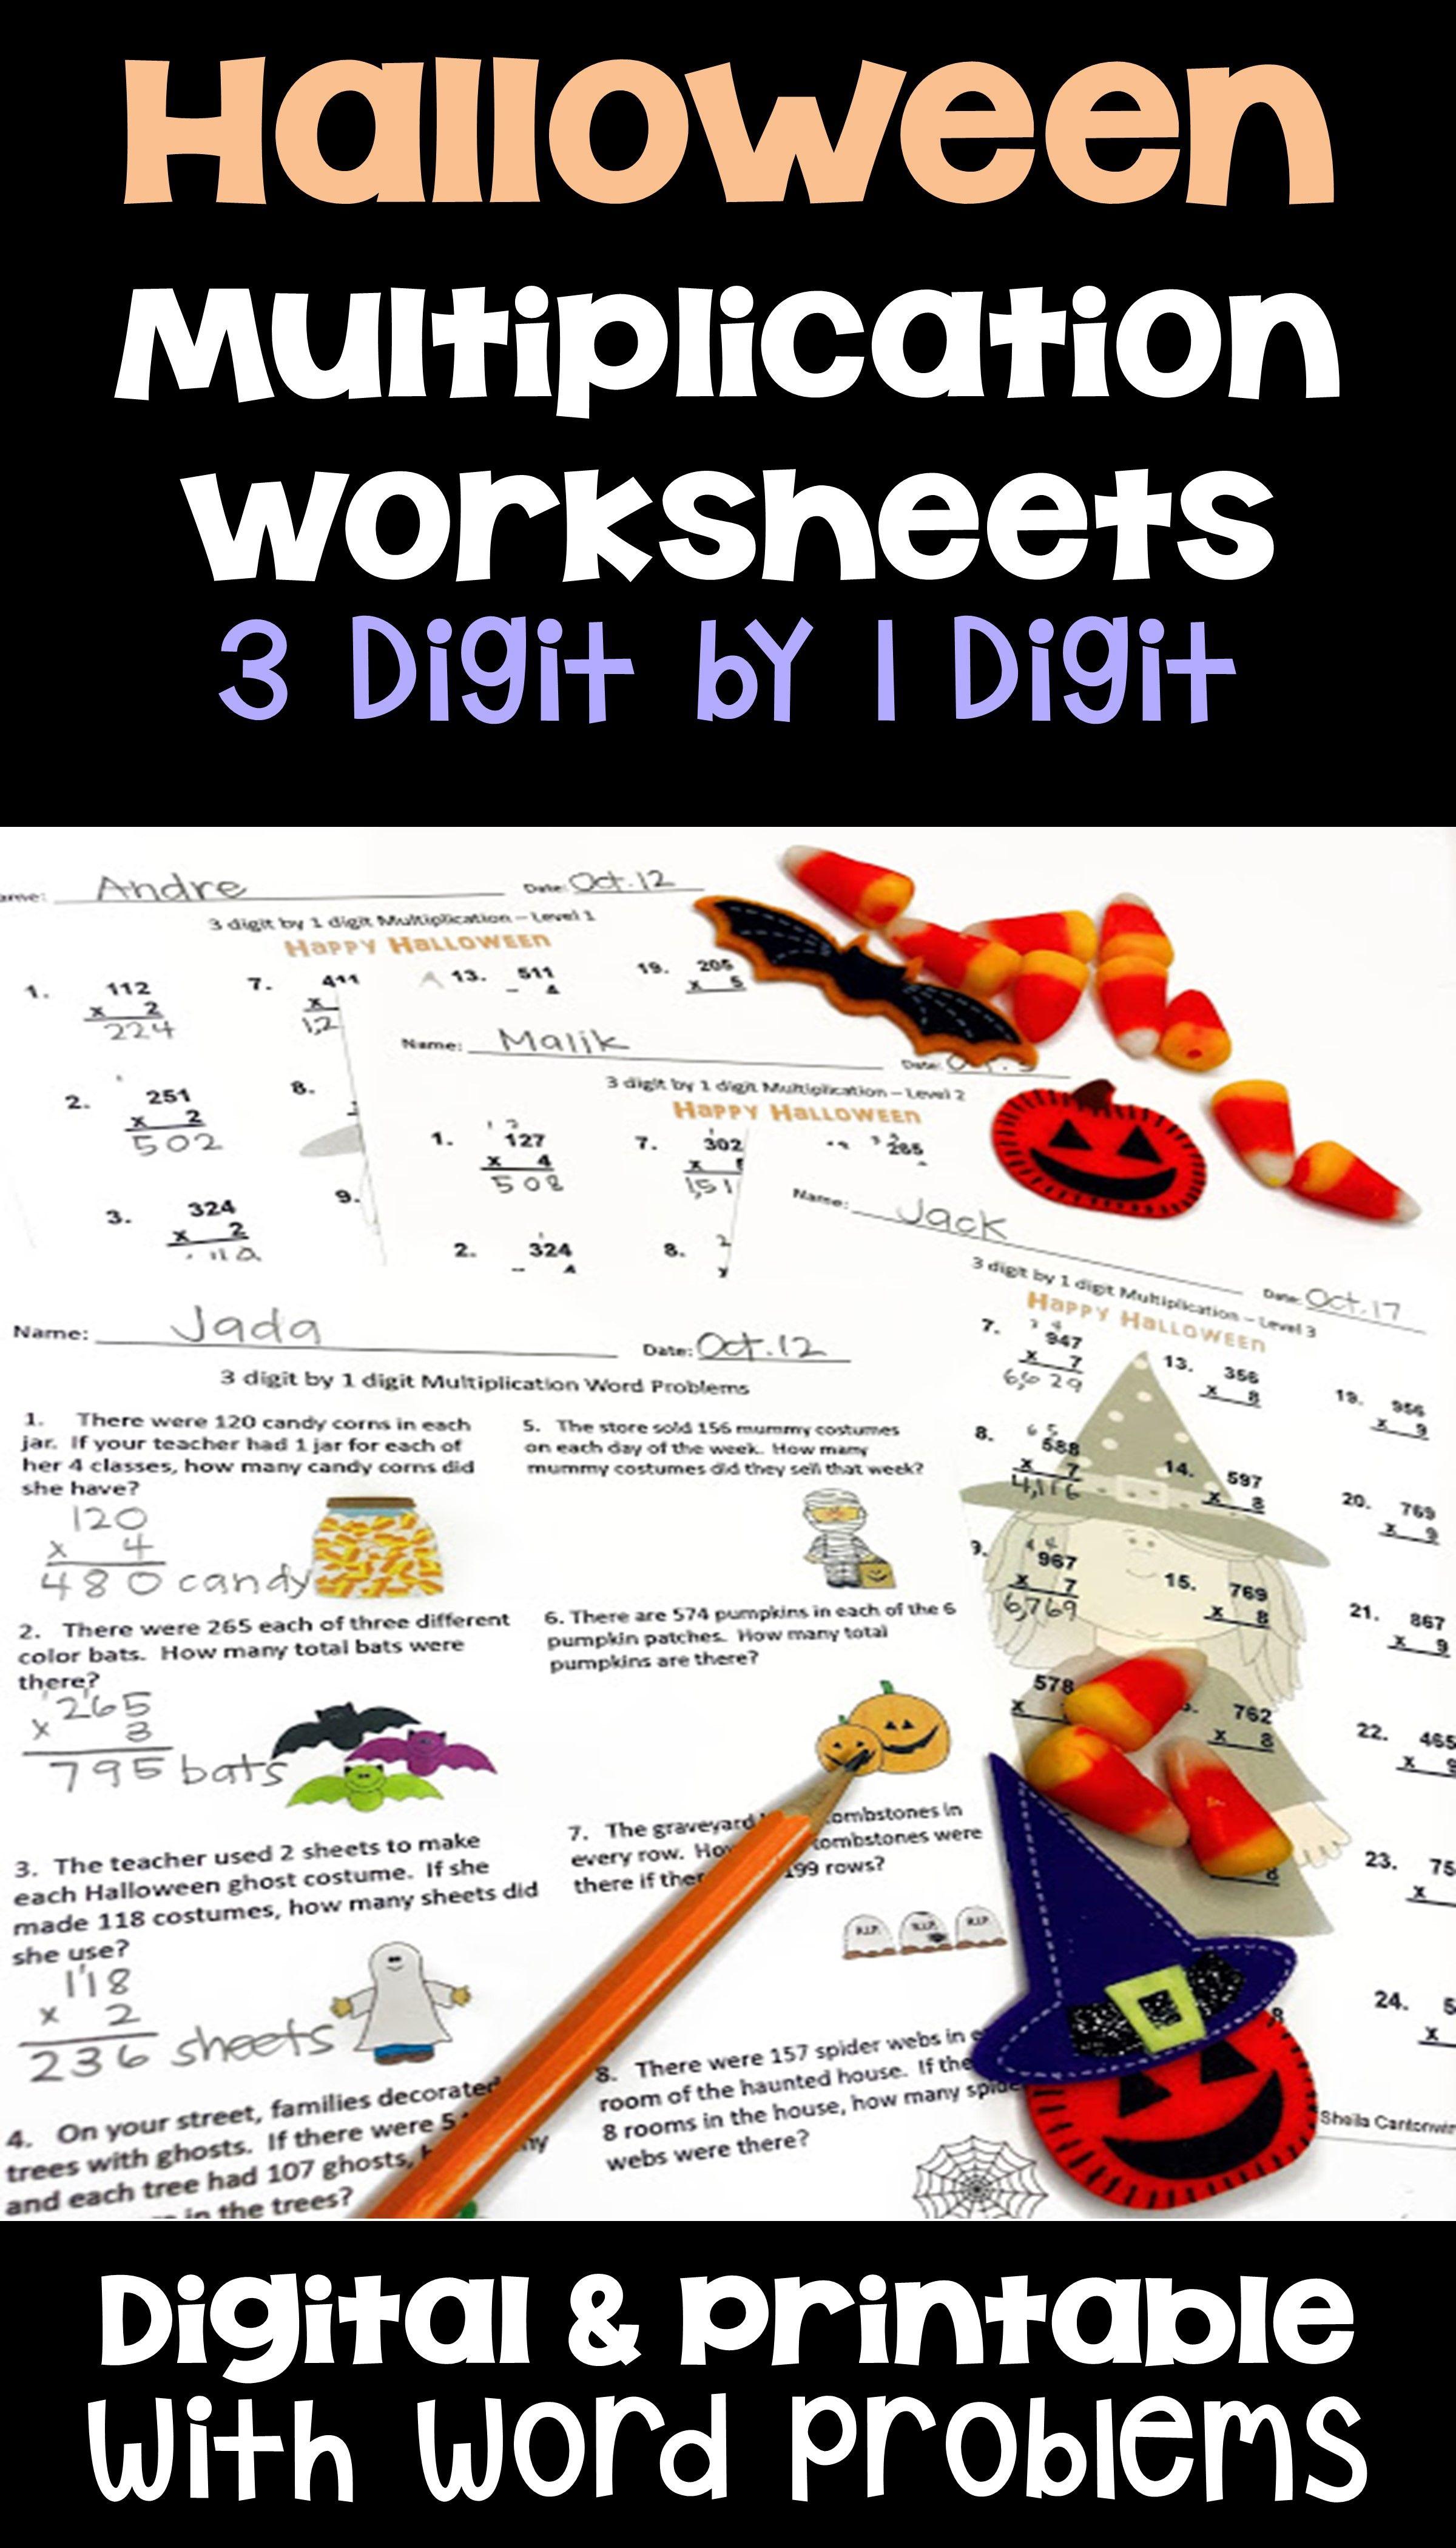 Halloween Math 3 Digit By 1 Digit Multiplication